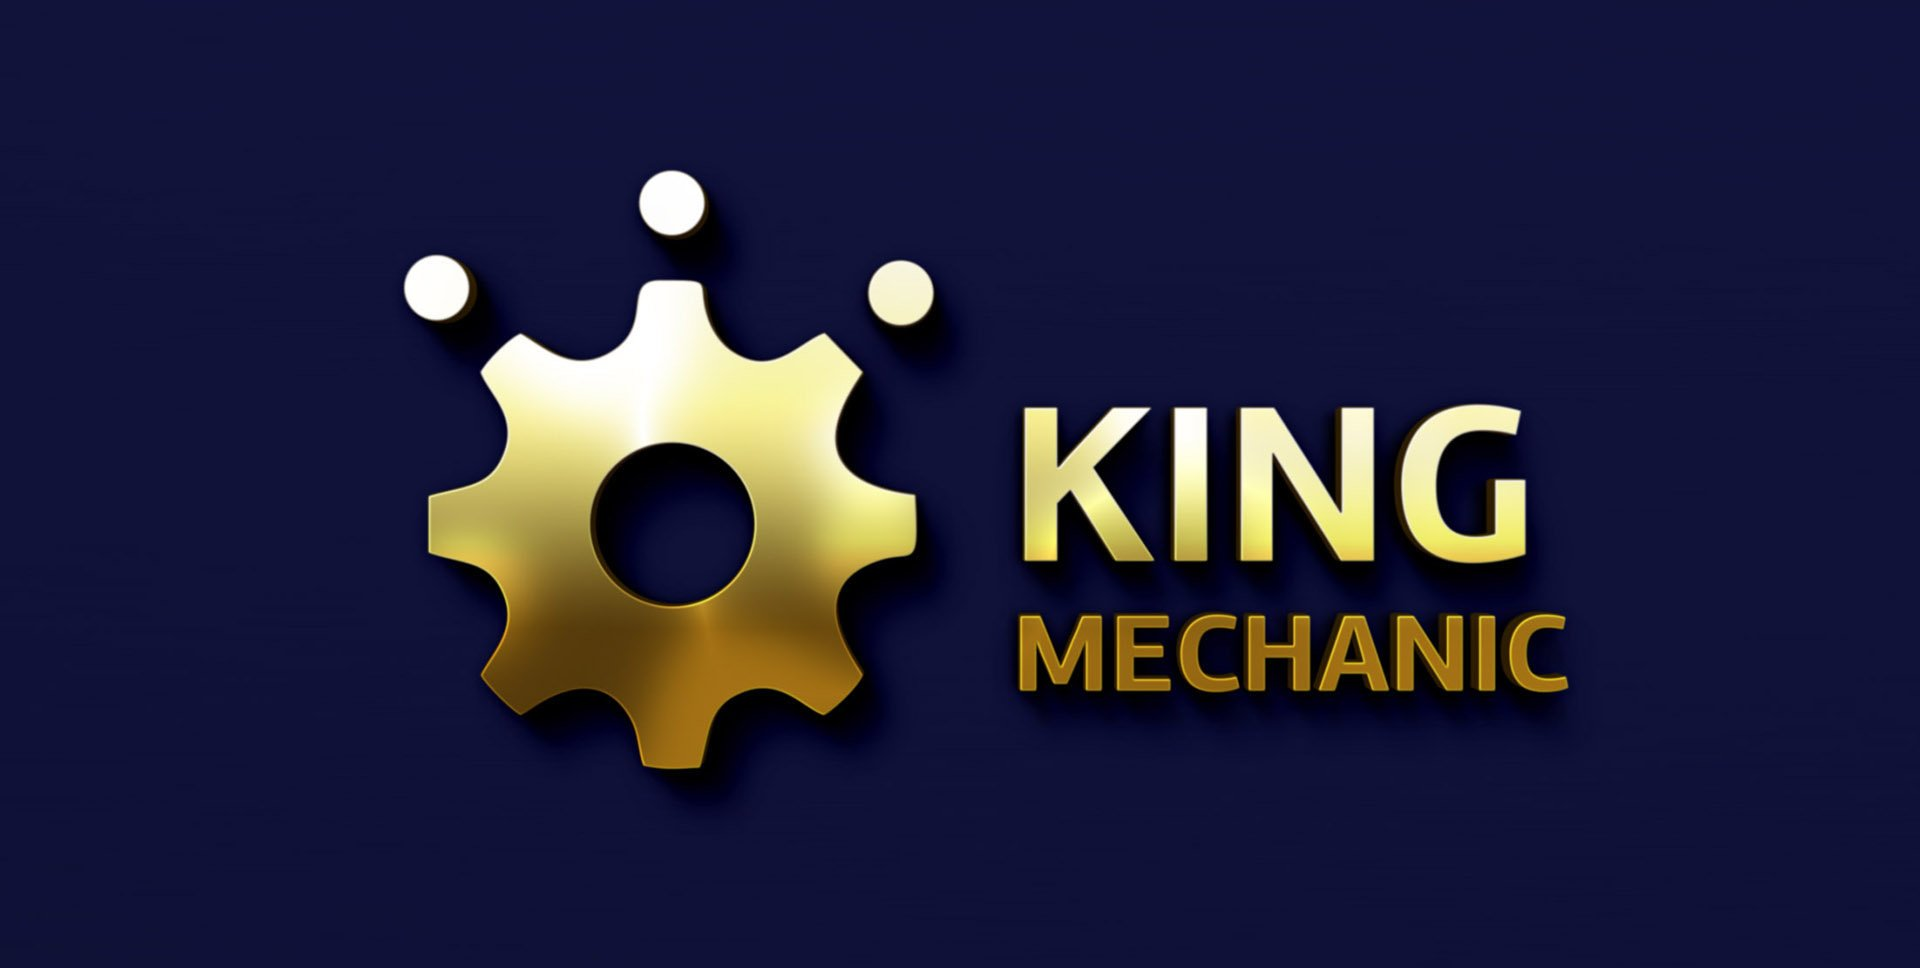 Дизайн 3D логотипа